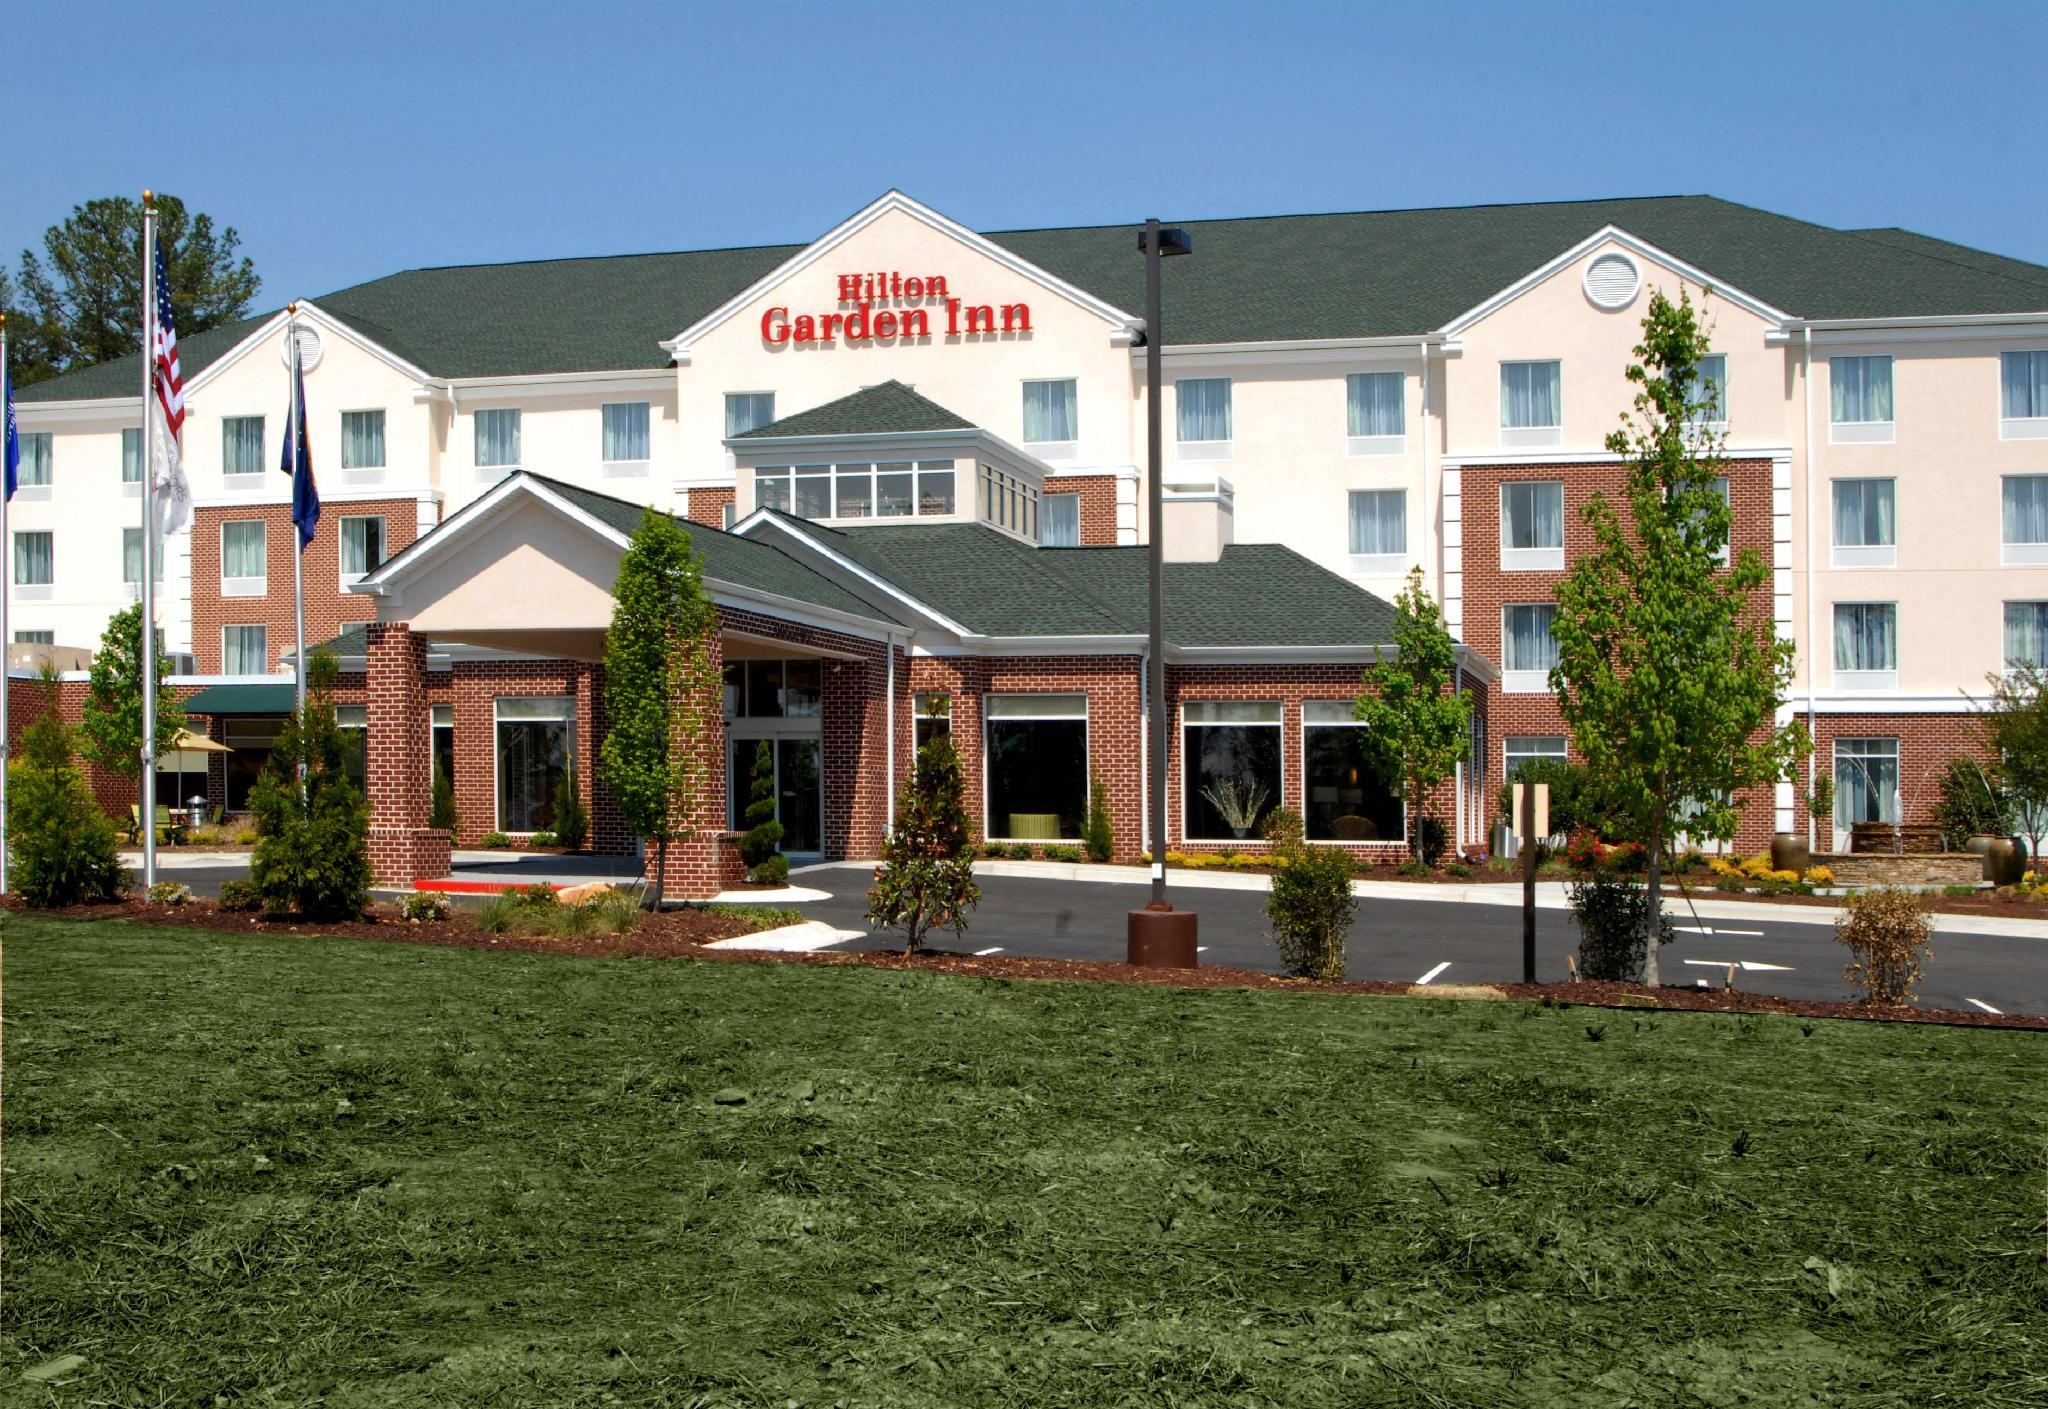 Hilton Garden Inn Atlanta Peachtree City